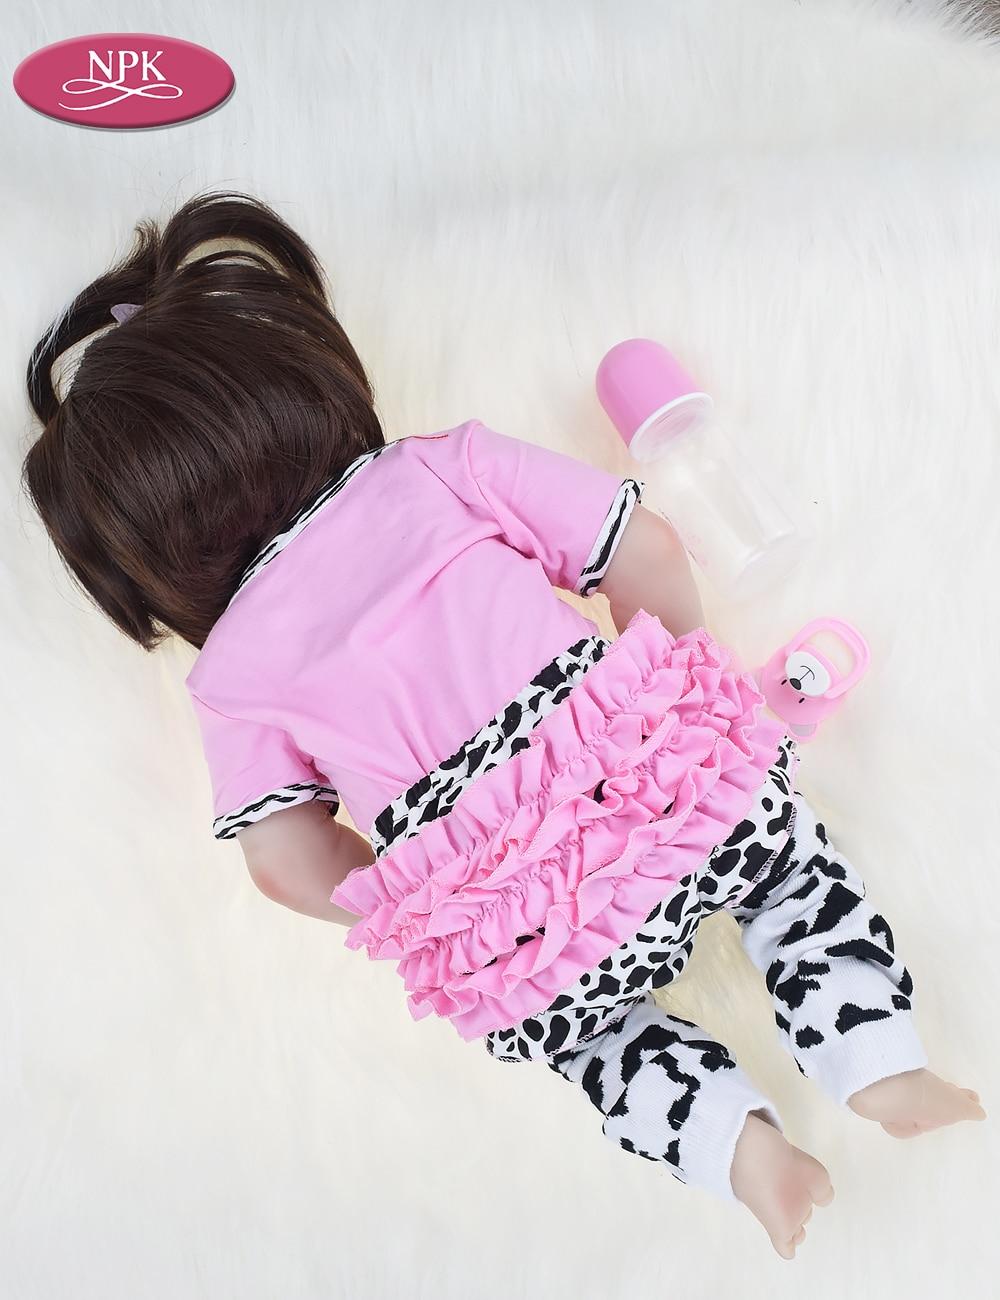 NPK Real 57CM Full Body SIlicone Girl Reborn Babies Doll Bath Toy Lifelike Newborn Princess Baby Doll Bonecas Bebe Reborn Menina (14)